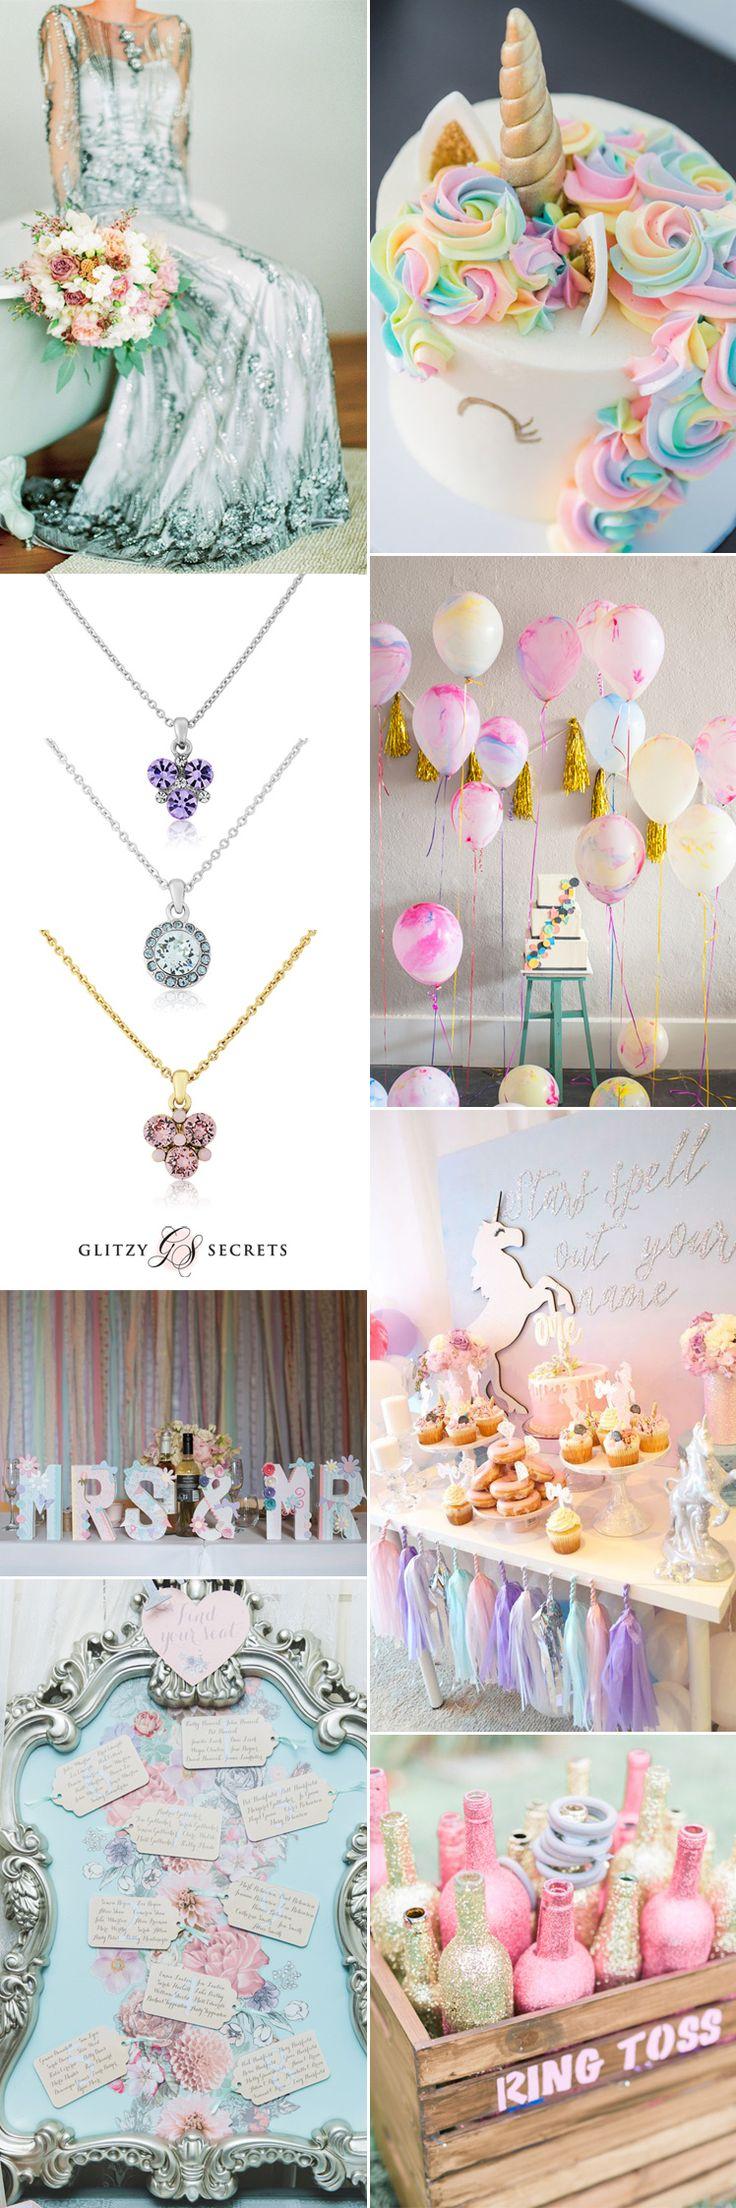 Magical pastel unicorn wedding ideas on GS Inspiration - Glitzy Secrets